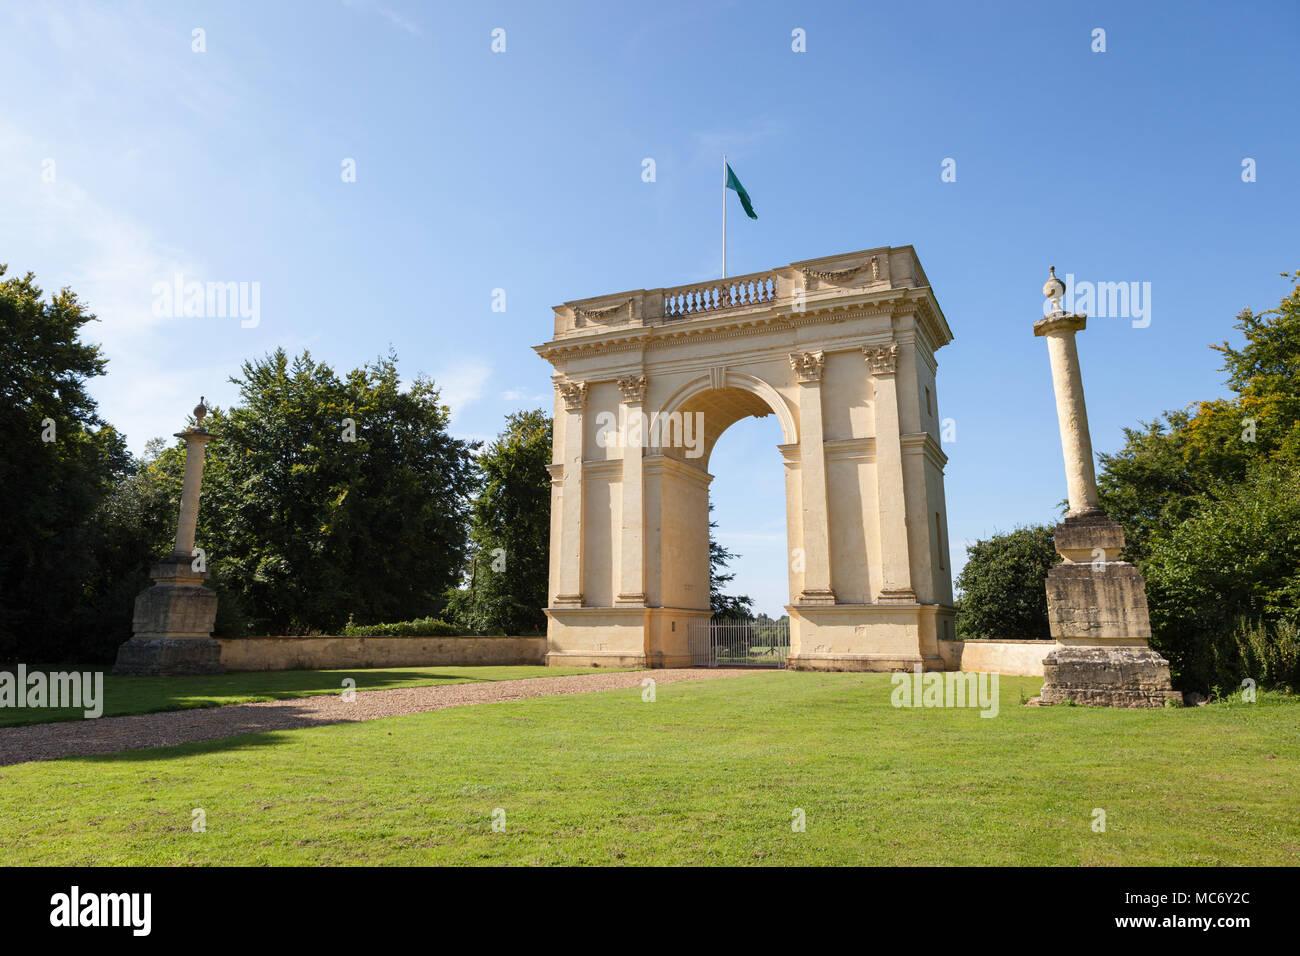 The Corinthian Arch, Stowe Landscape Gardens, Stowe House, Buckinghamshire, England, UK - Stock Image